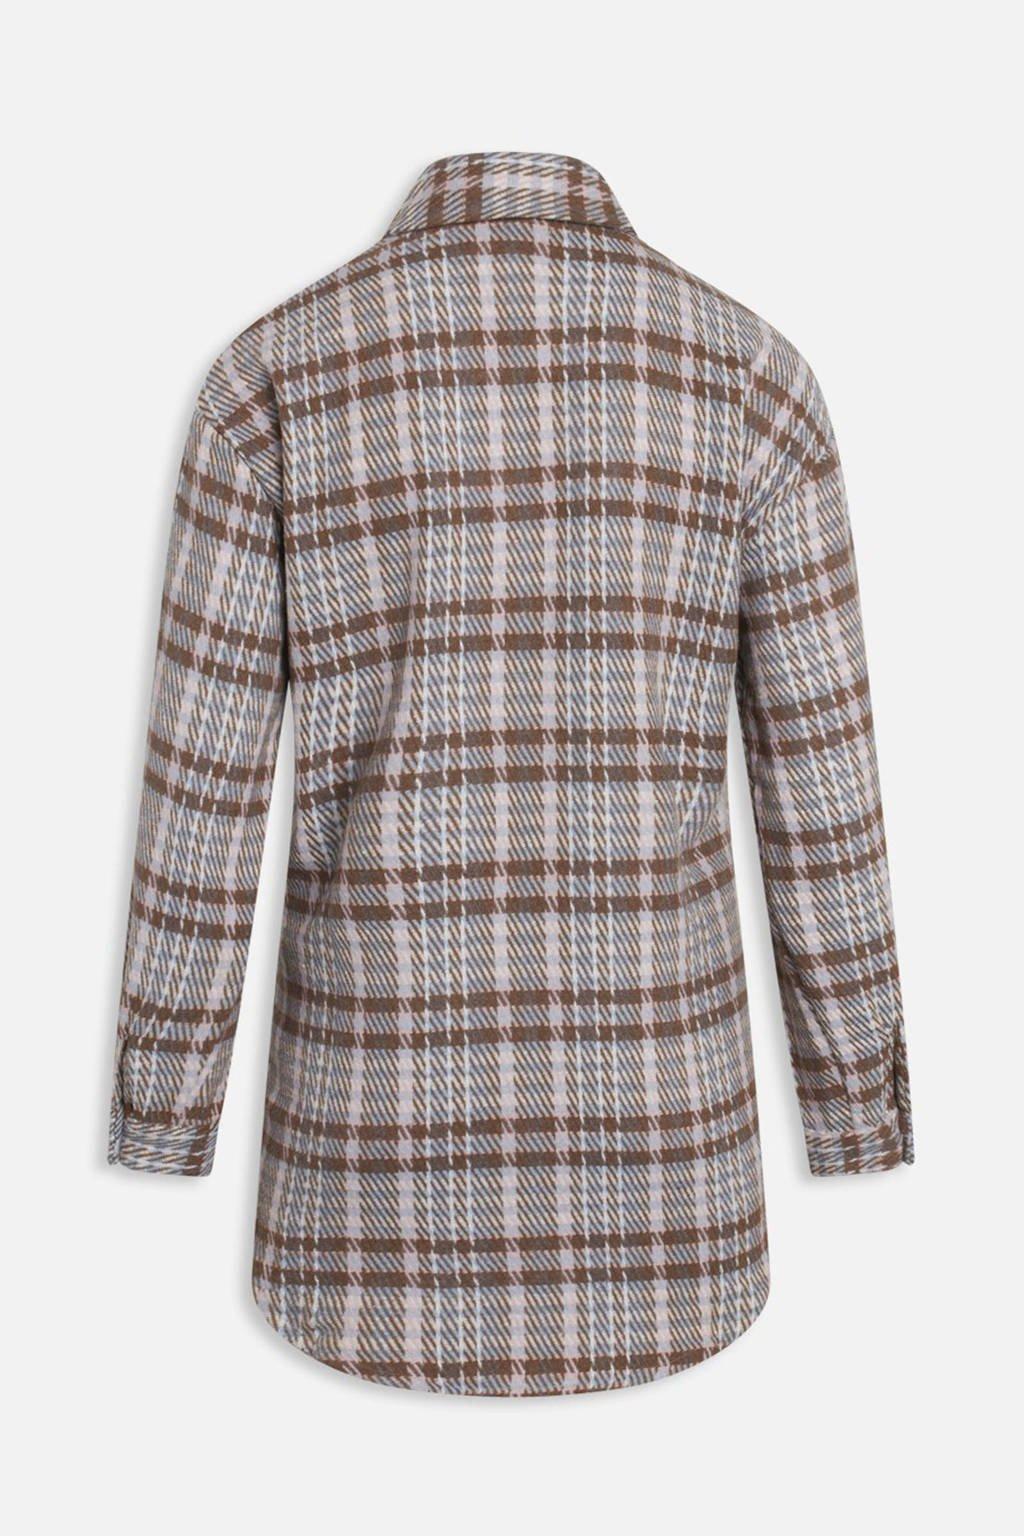 SisterS Point geruite blouse beige/bruin, Beige/bruin